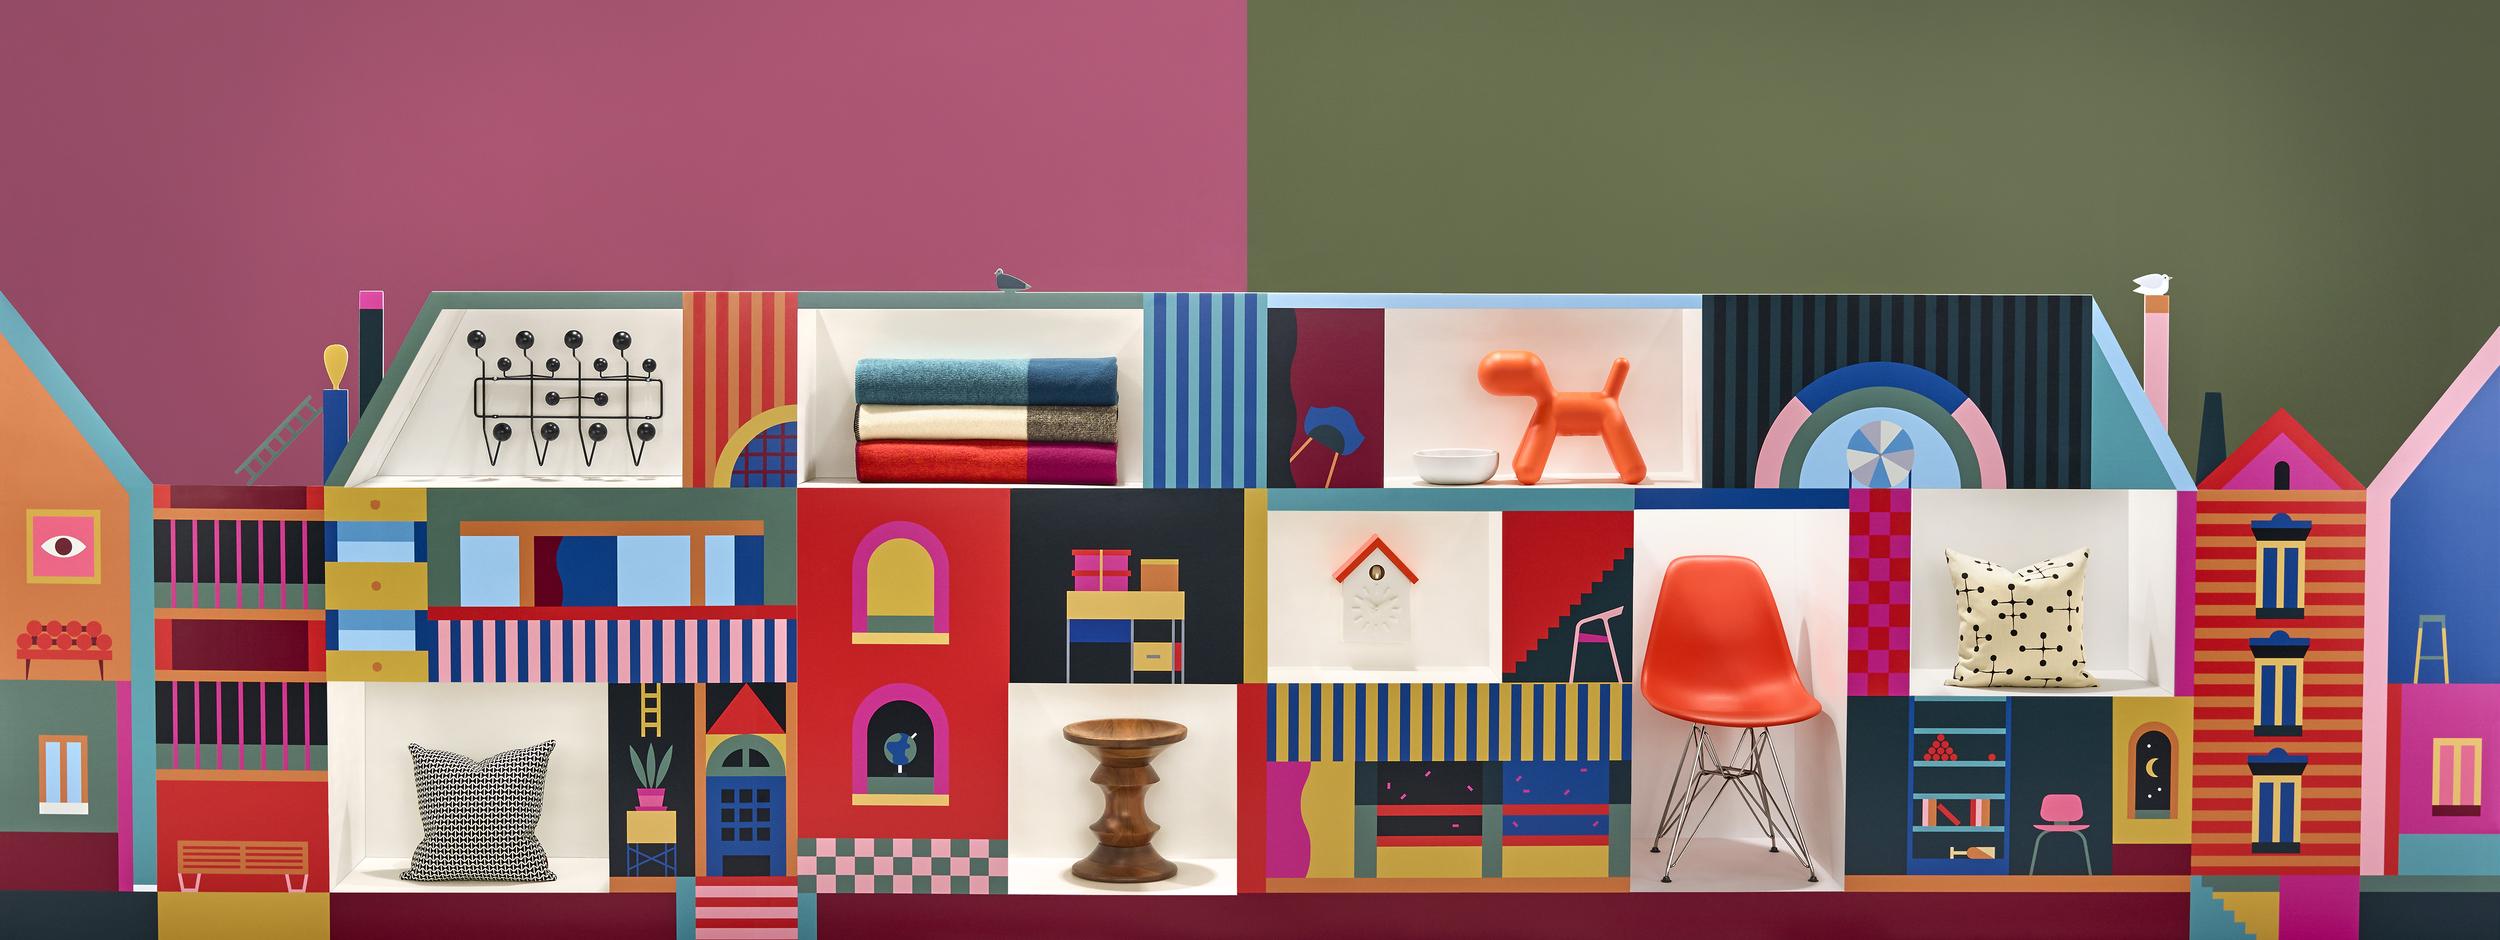 Inspired Gifts Campaign. Illustration: Lotta Nieminen